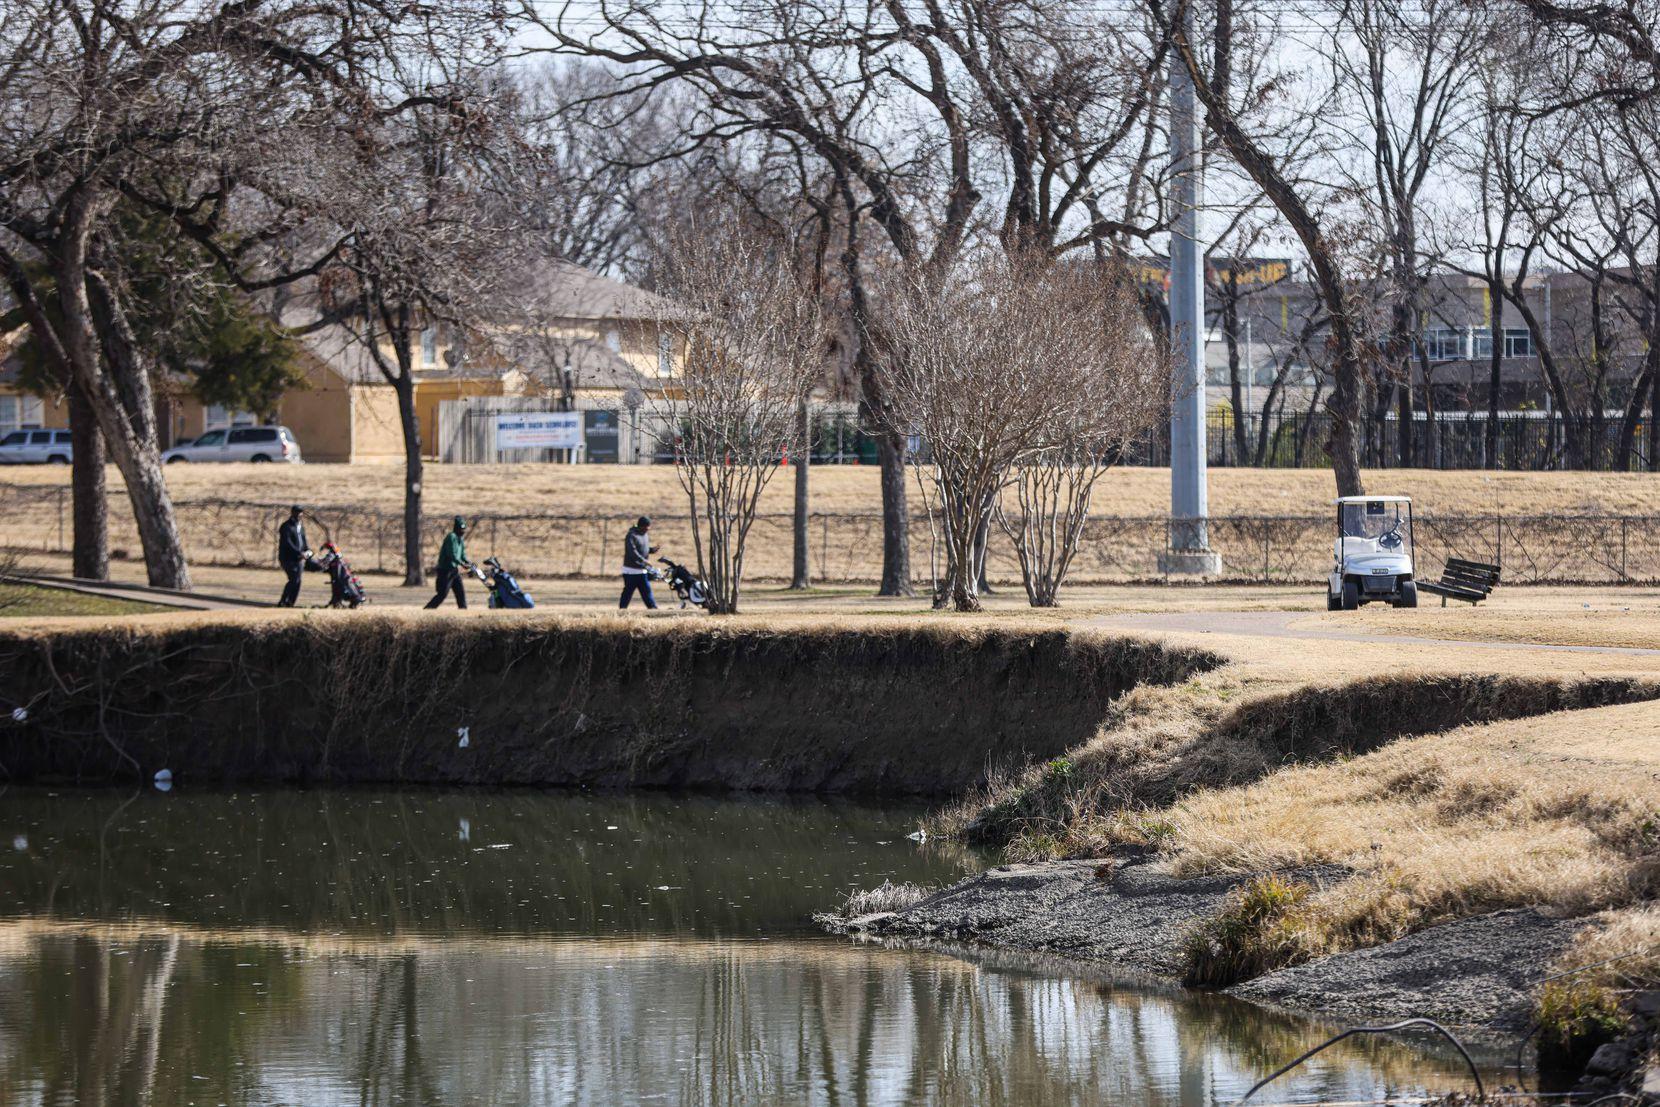 Golfers walk near an eroded section of Tenison Glen Golf Course in Dallas.